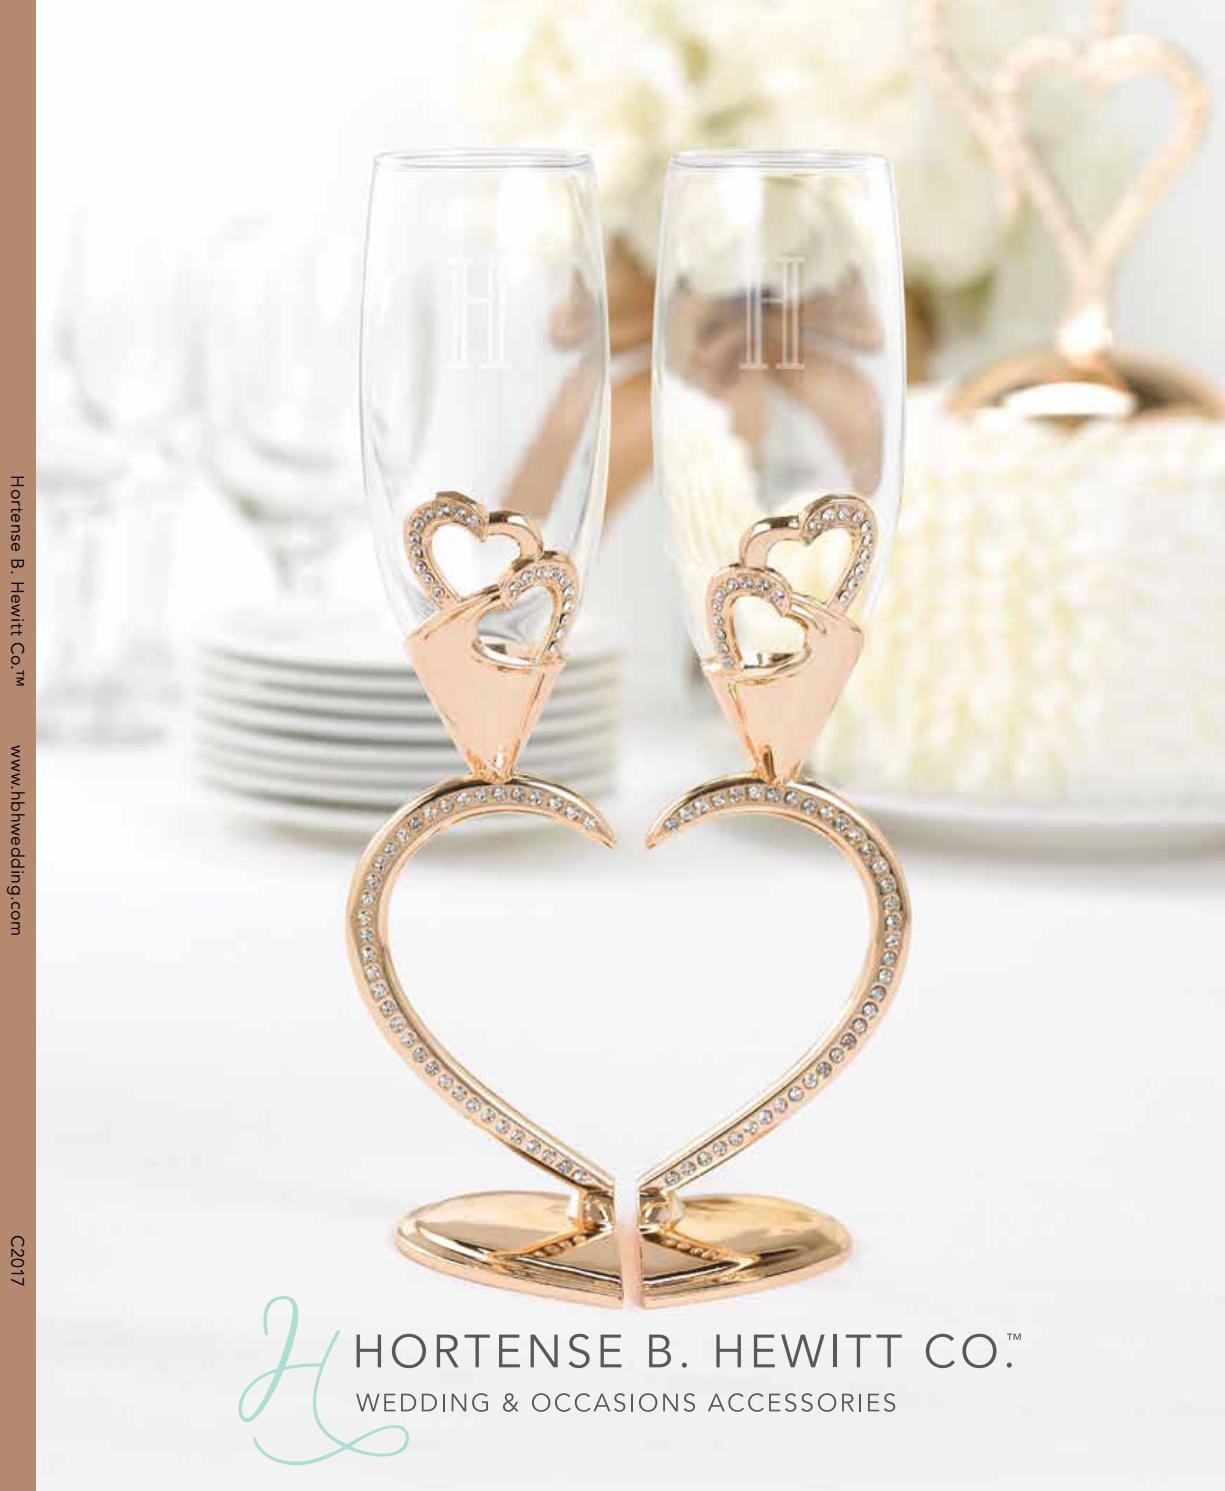 Hortense B Hewitt 42260 Wedding Accessories Jute Travel Bag his